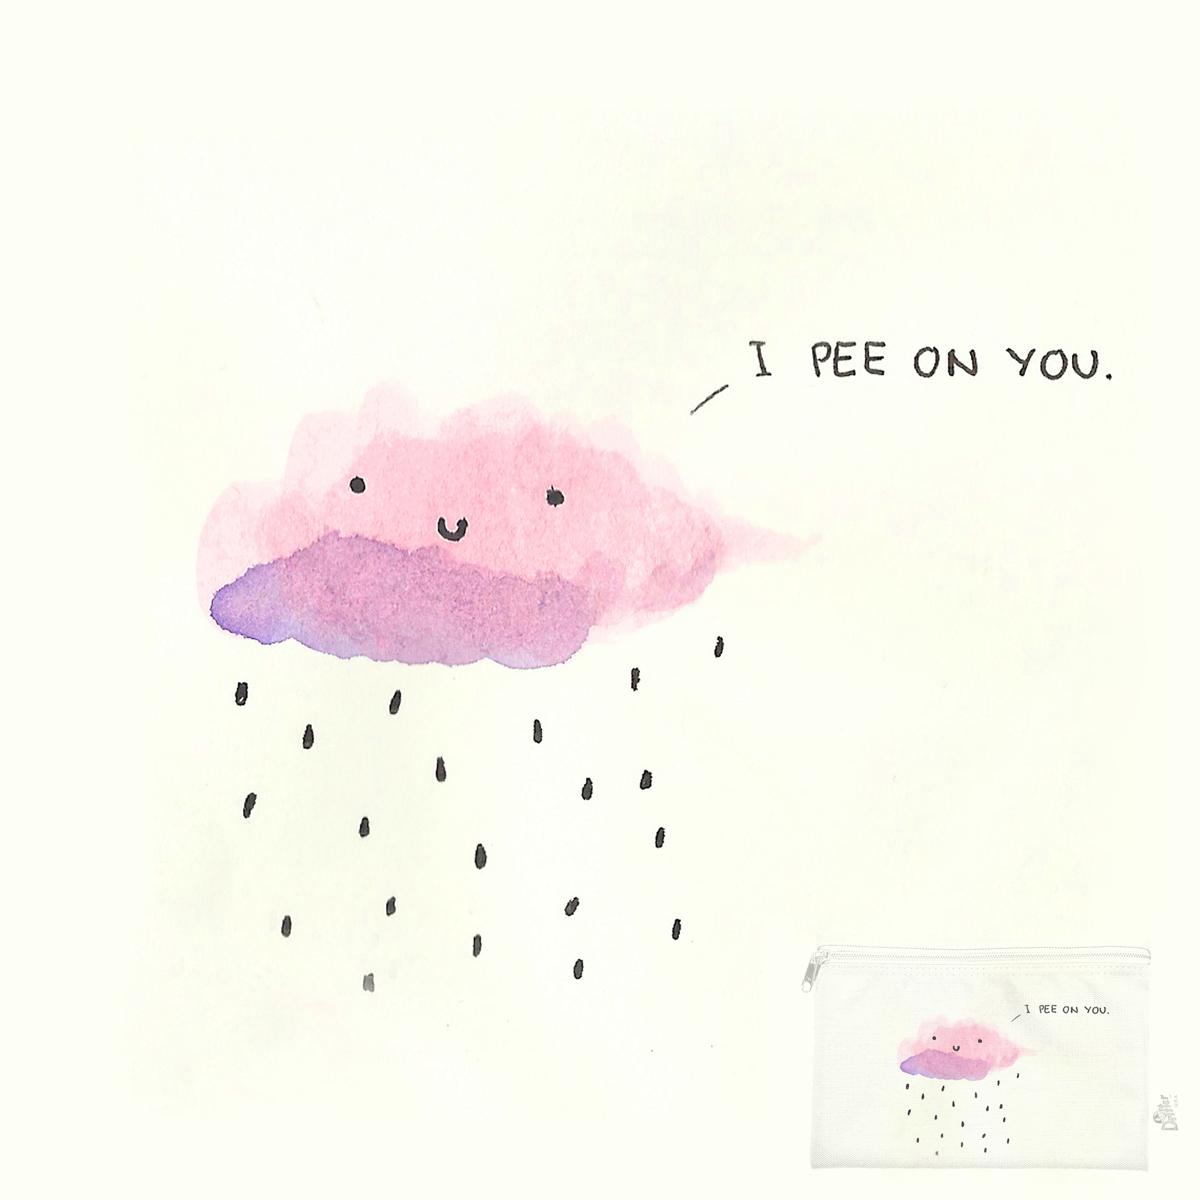 I pee on you by Alba Blazquez Fernandez on Threadless